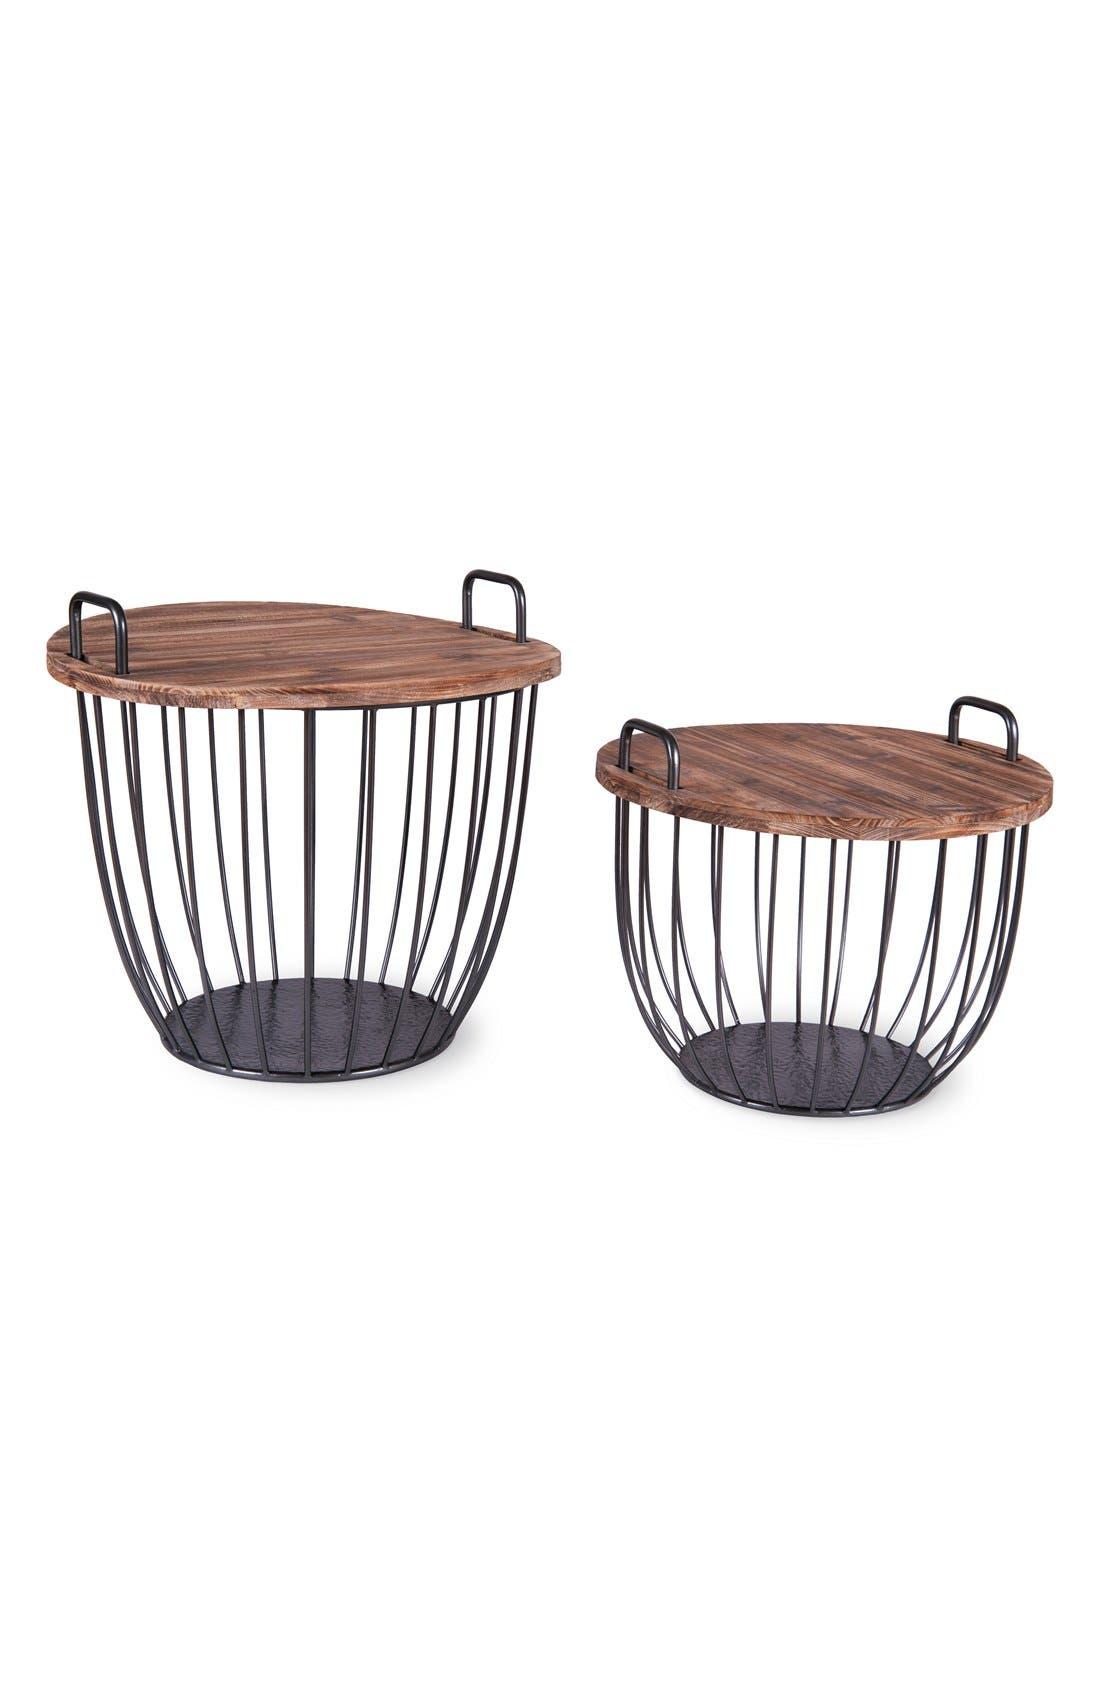 Main Image - Foreside Basket Tables (Set of 2)